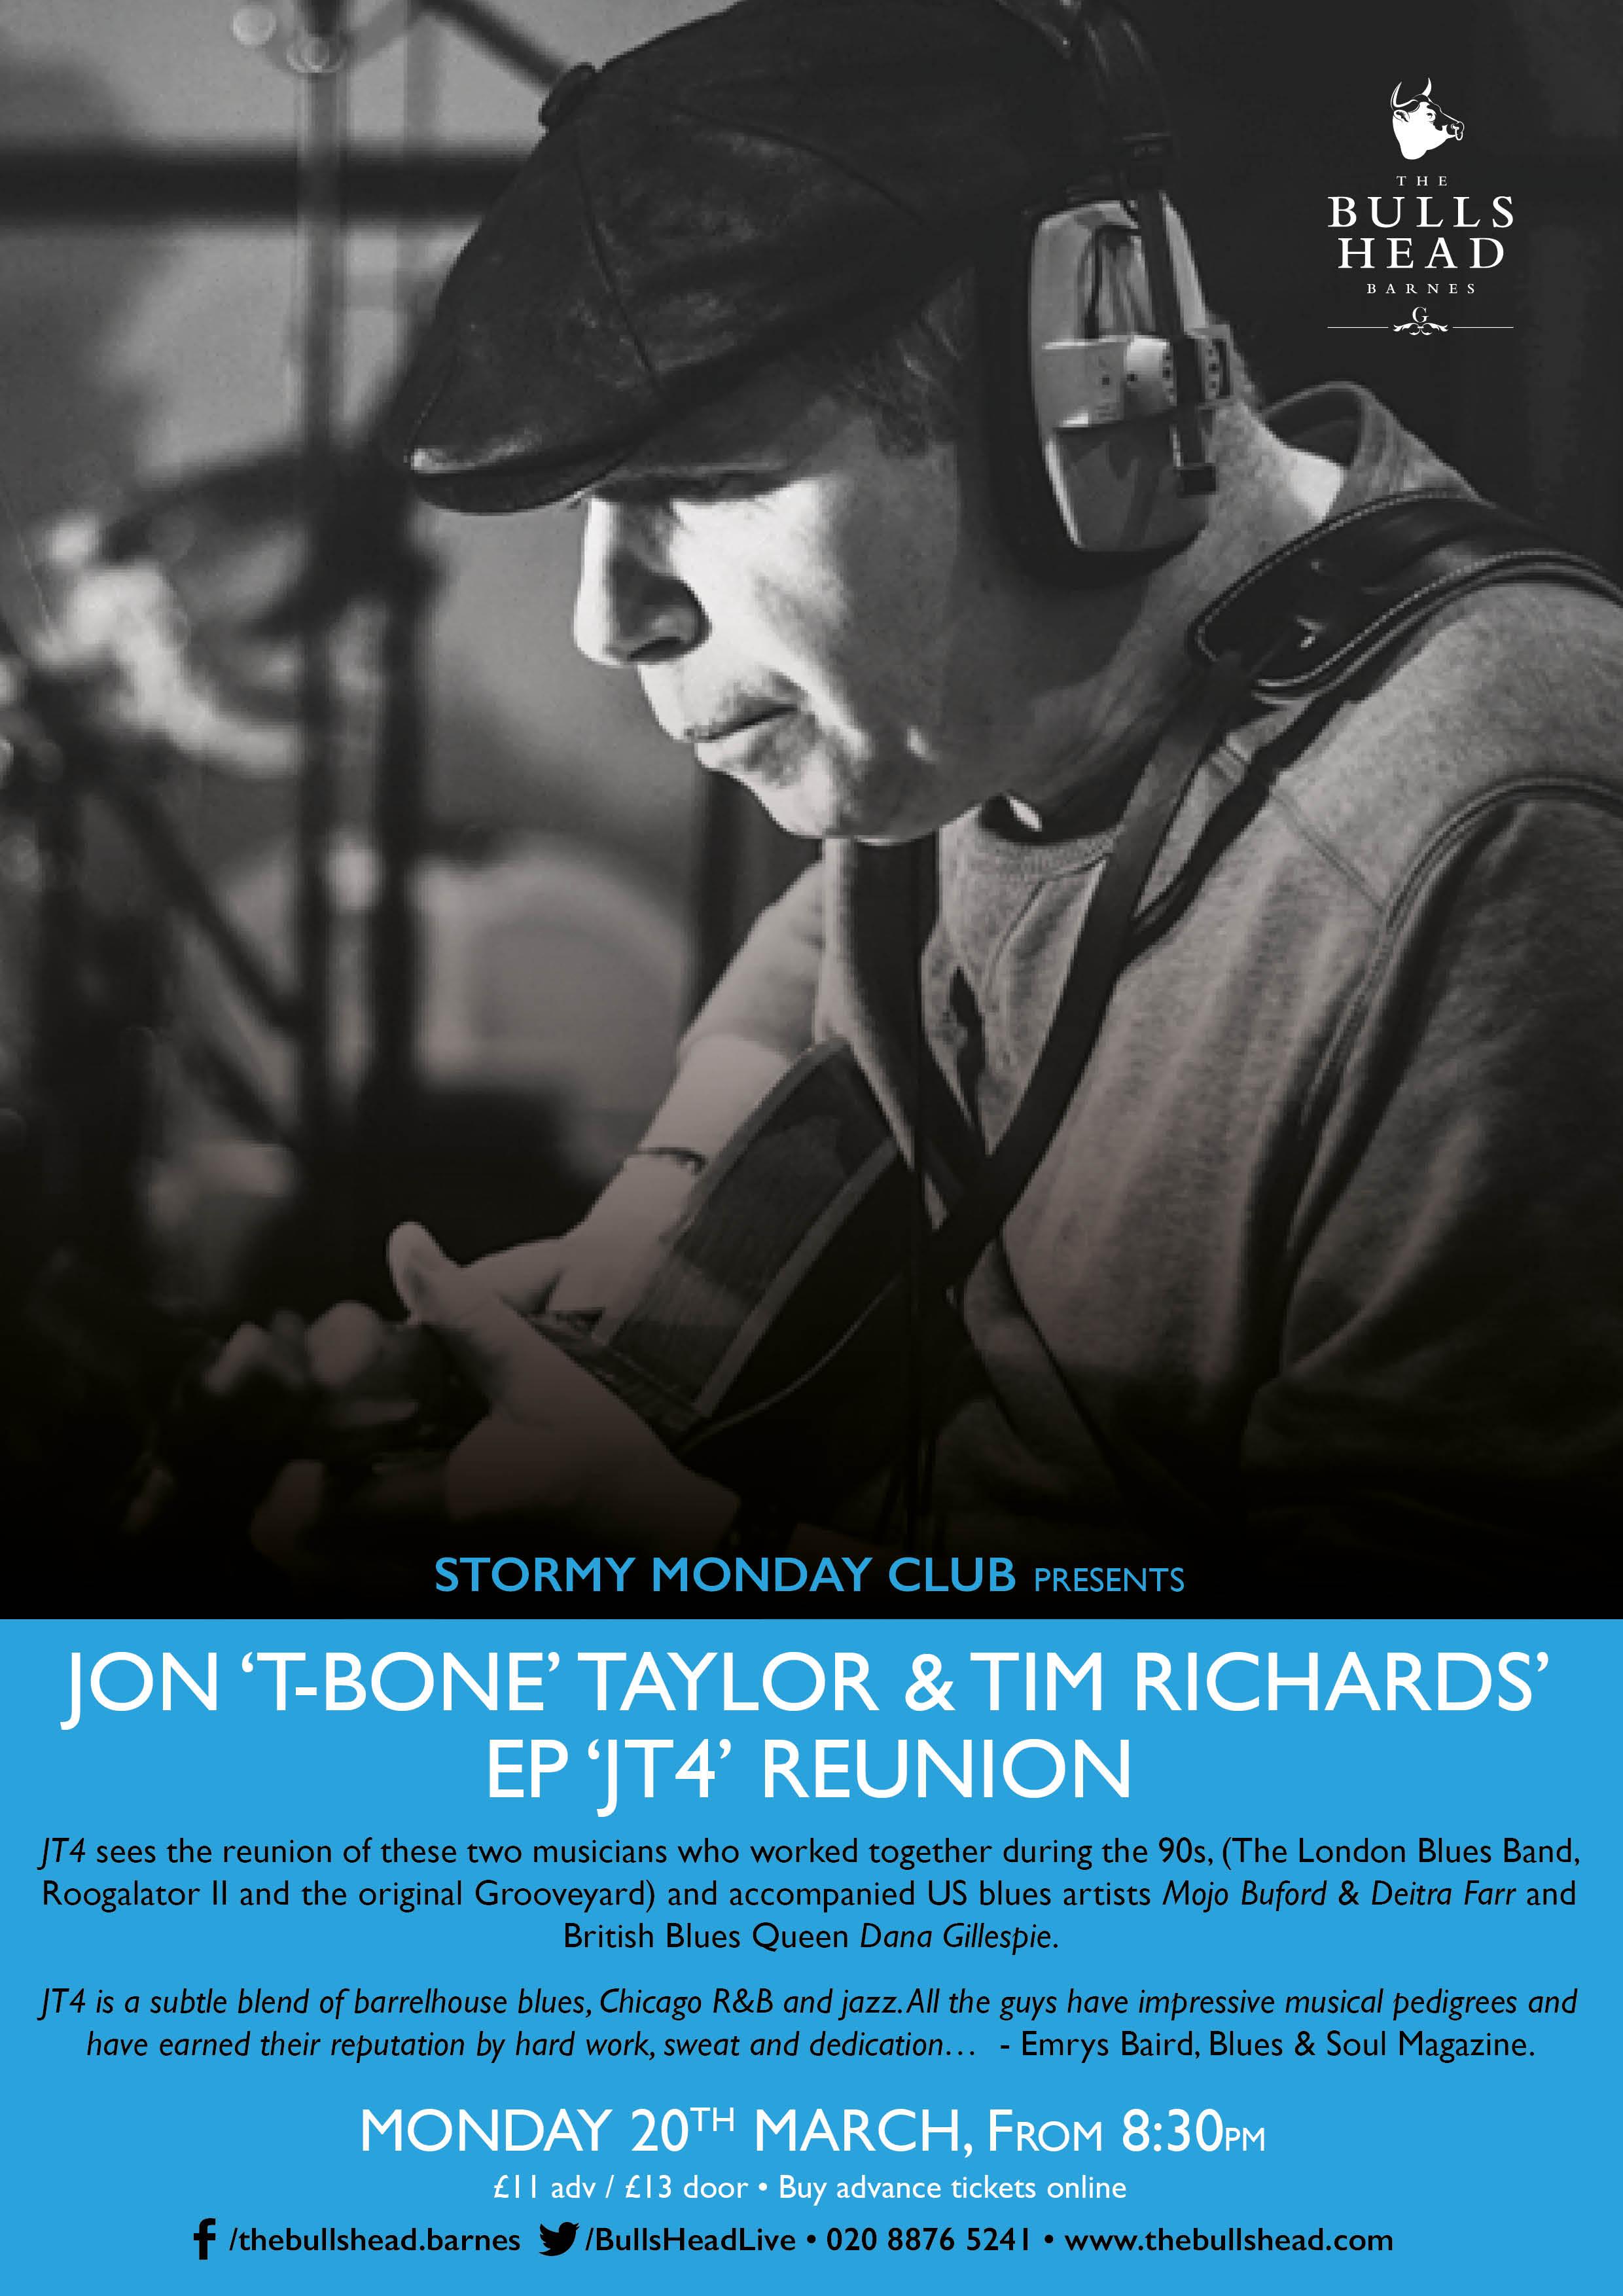 Jon 'T Bone' Taylor and Tim Richard's Reunion EP 'JT4'